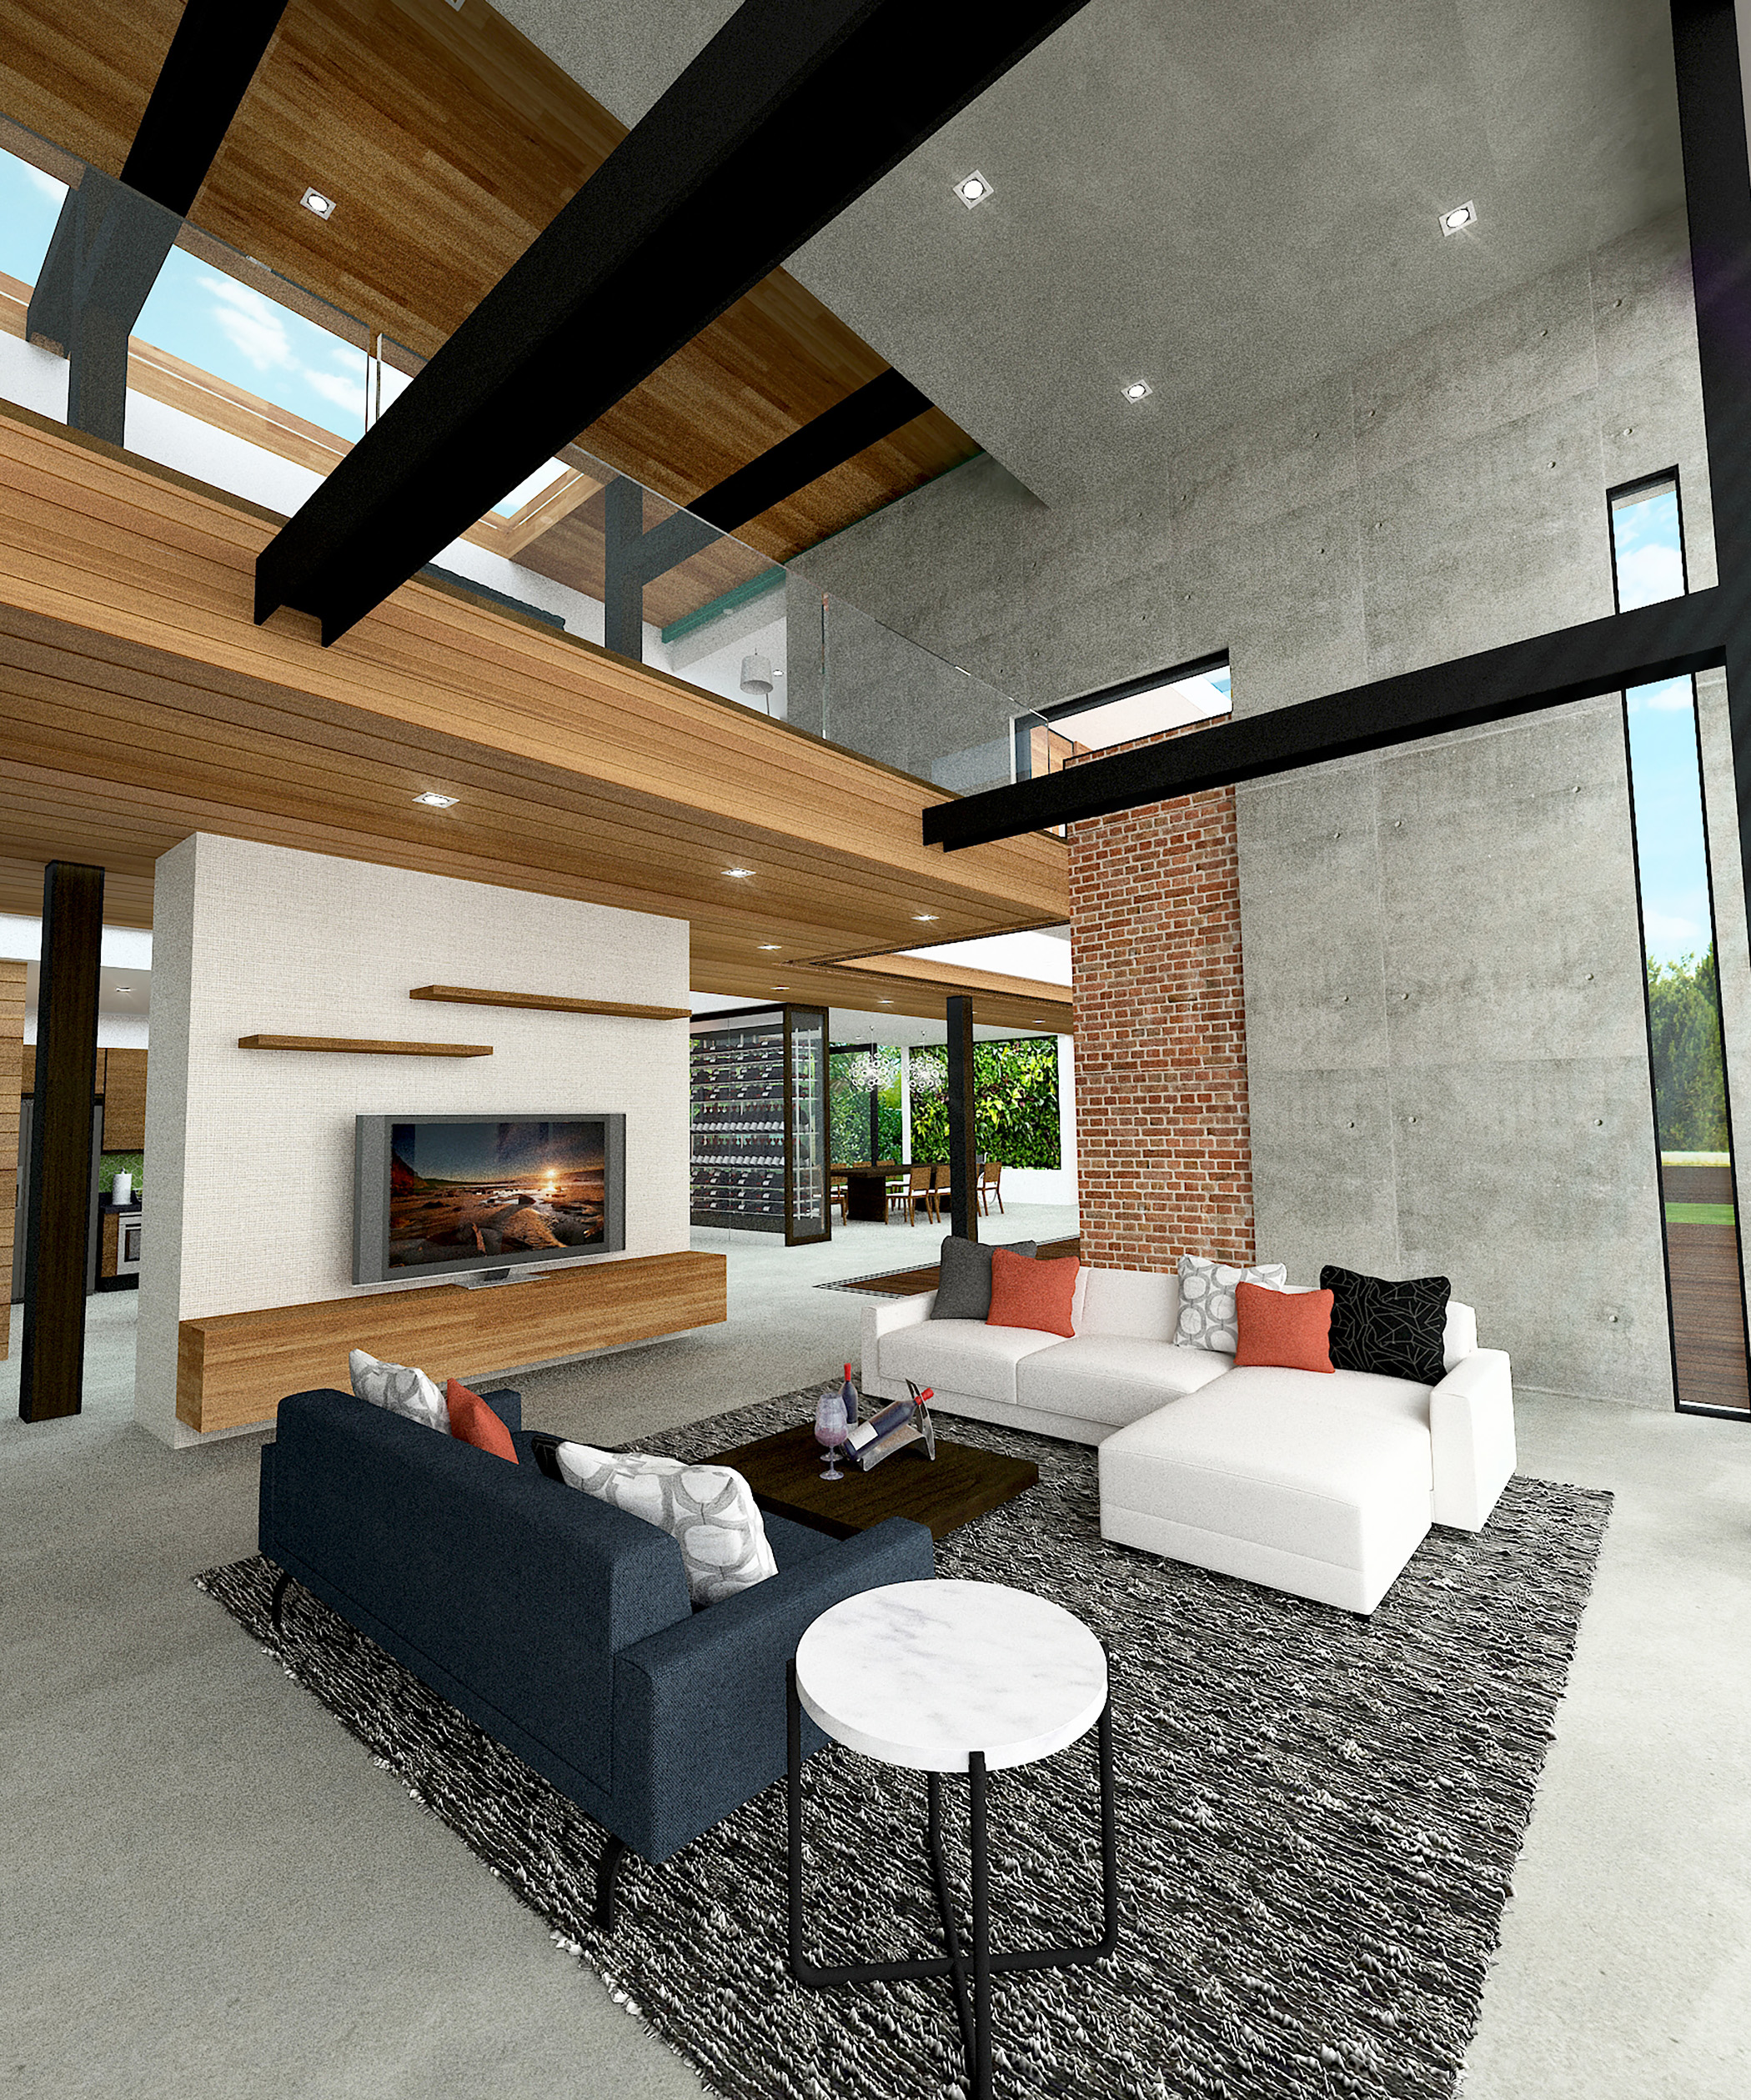 franzi-yiju-chen-duangjai-masrungson-adela-meana-sea-ridge-5310-mps-sustainable-interior-environments-residential-project_17640865772_o.jpg